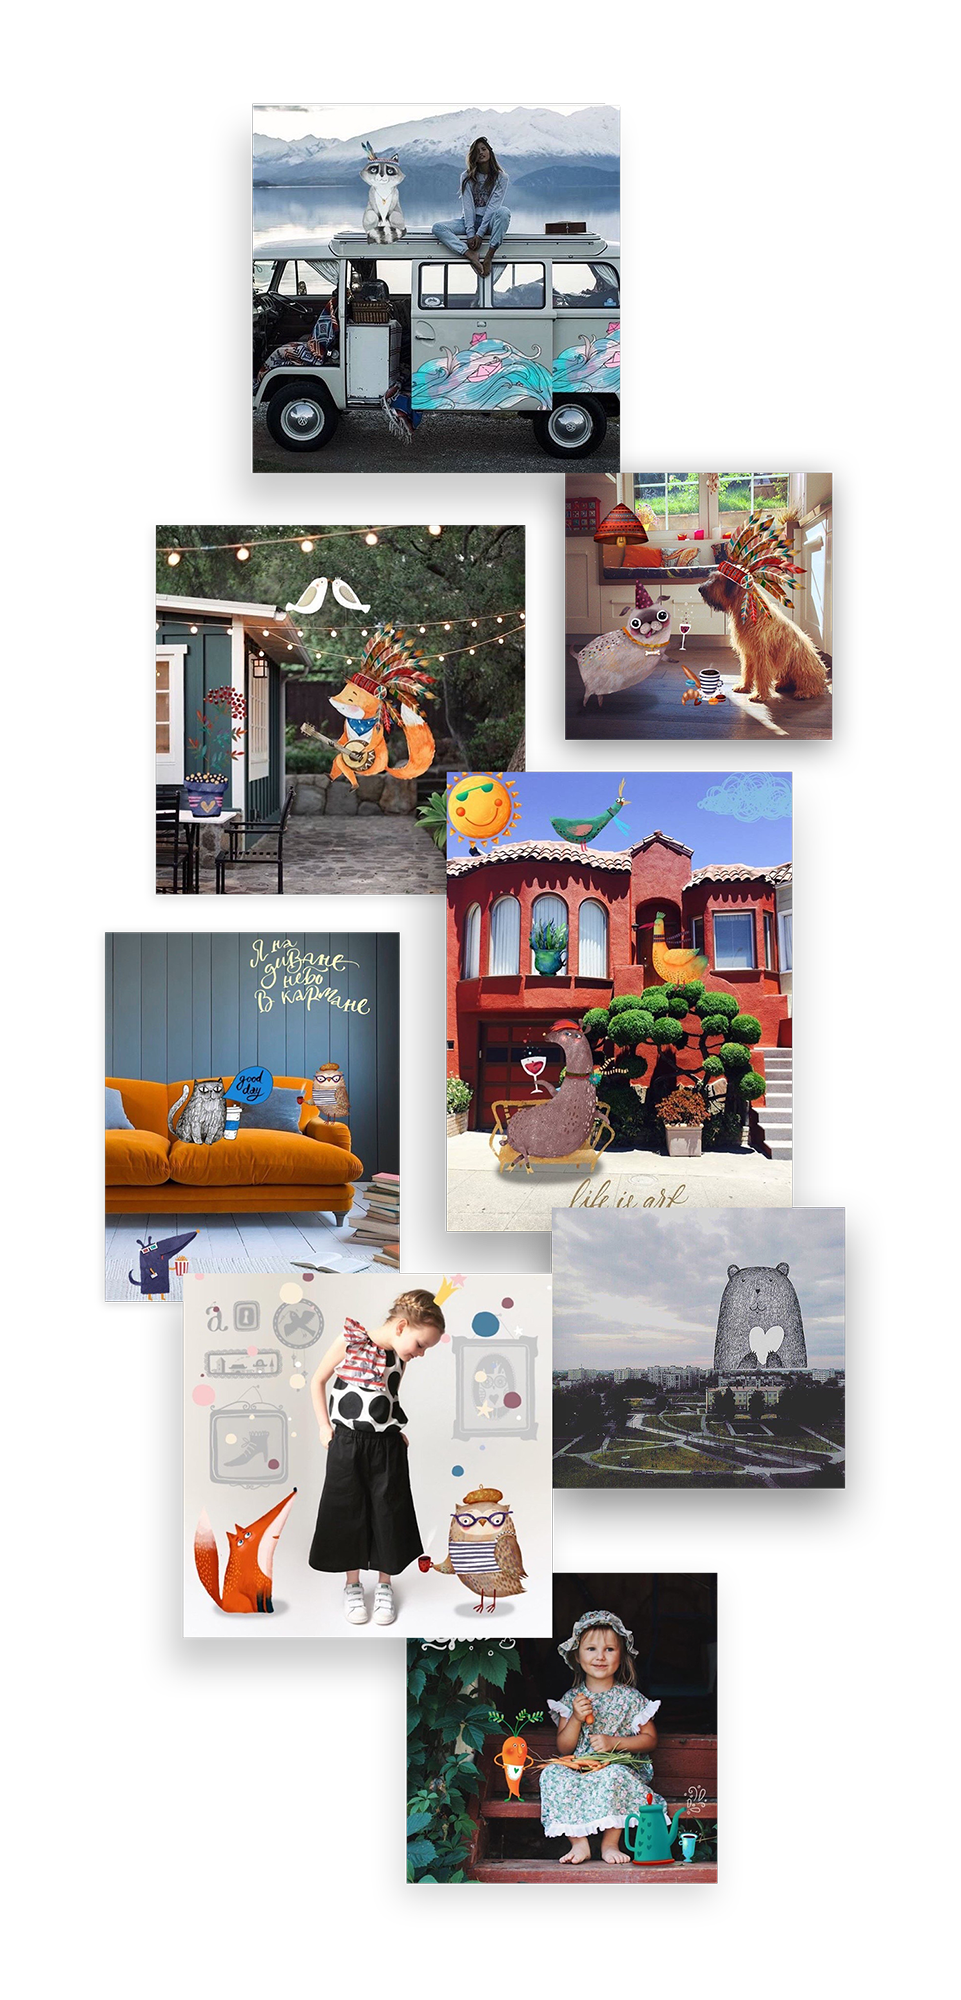 ☸ Spēle: Foto ceļojums 2018 / фото путешествиe  2018 Upload-31c1b410-b734-11e7-bf6b-77cb77215af9